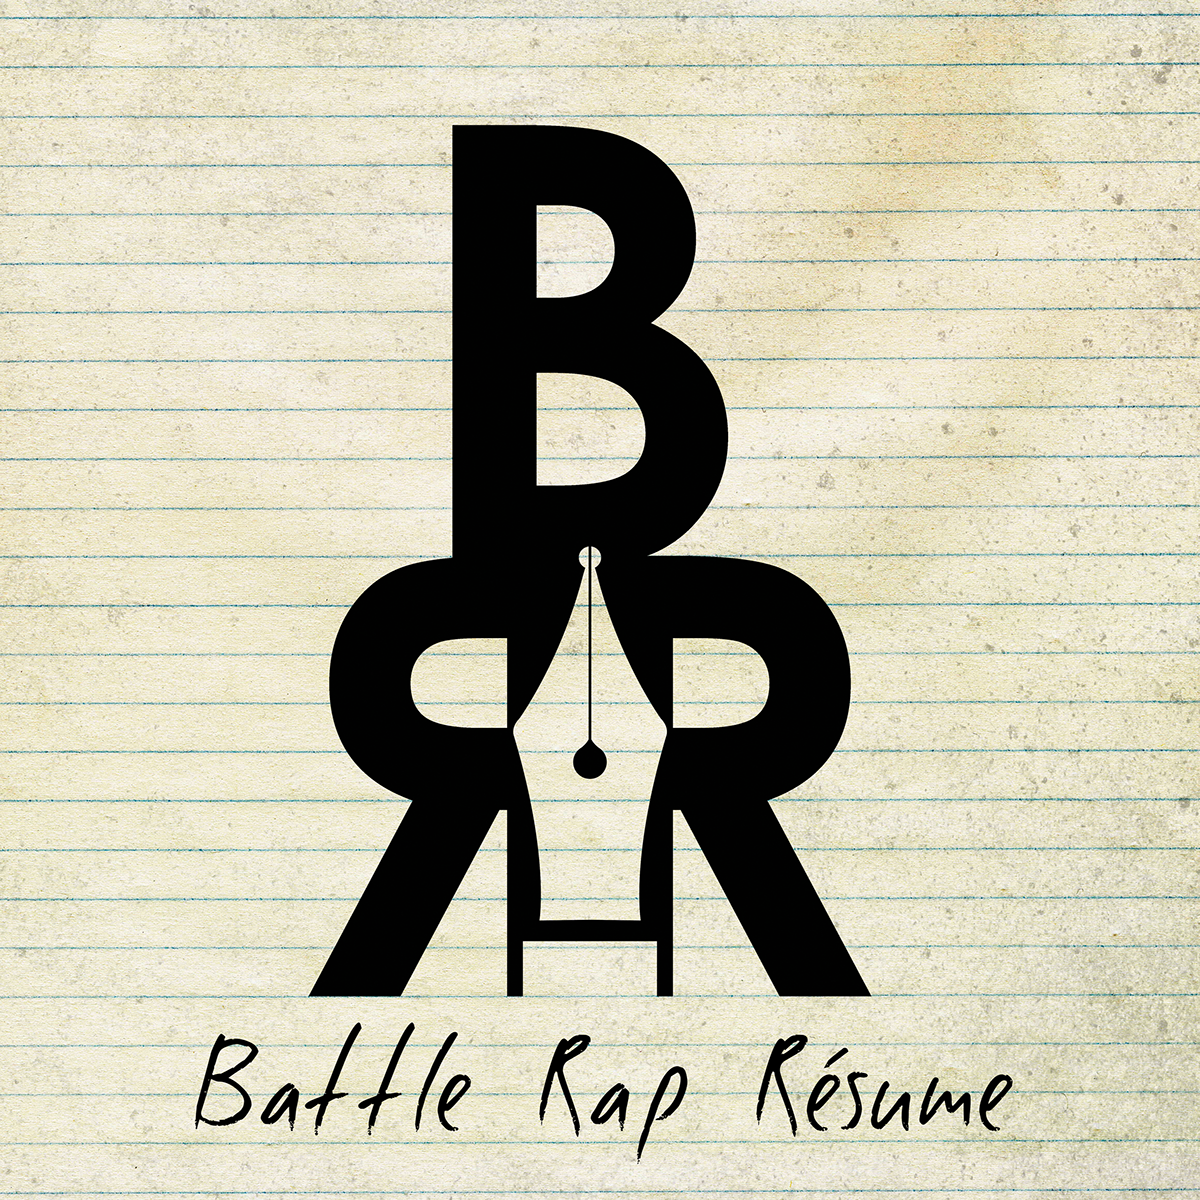 logo battle rap Resume podcast vector